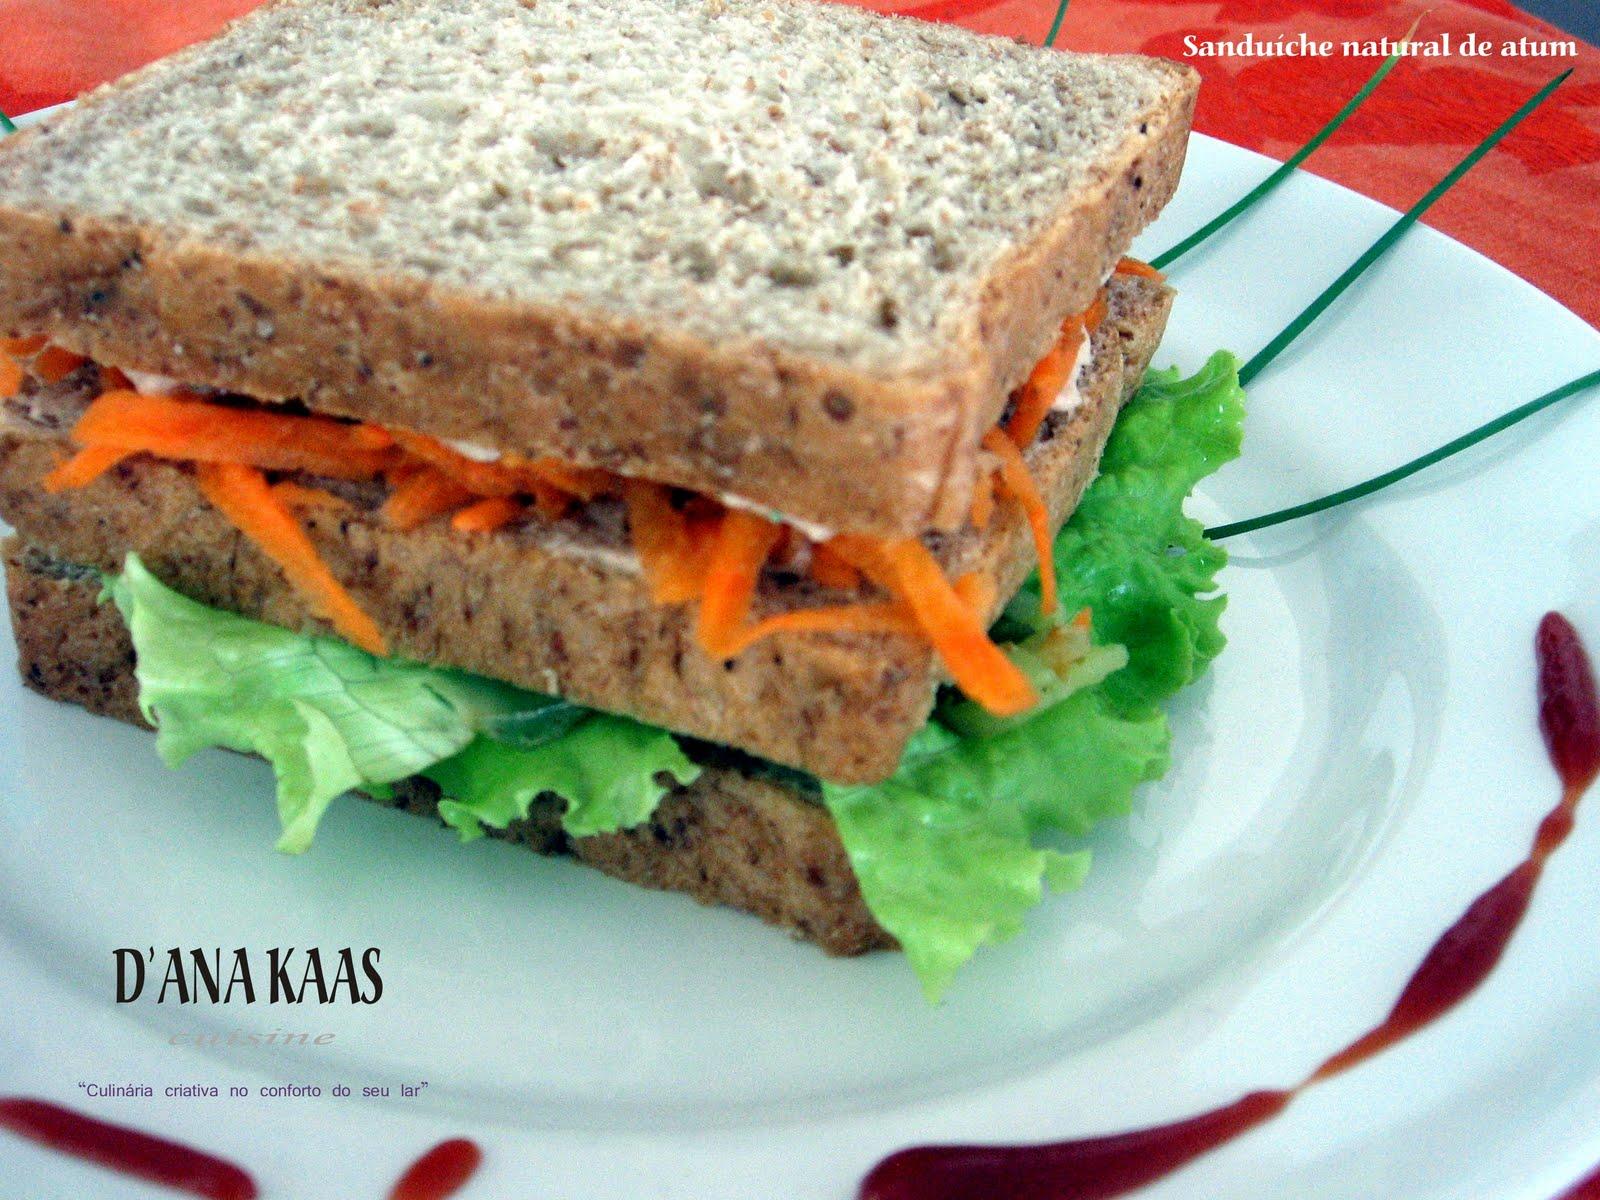 ANA KAAS cuisine